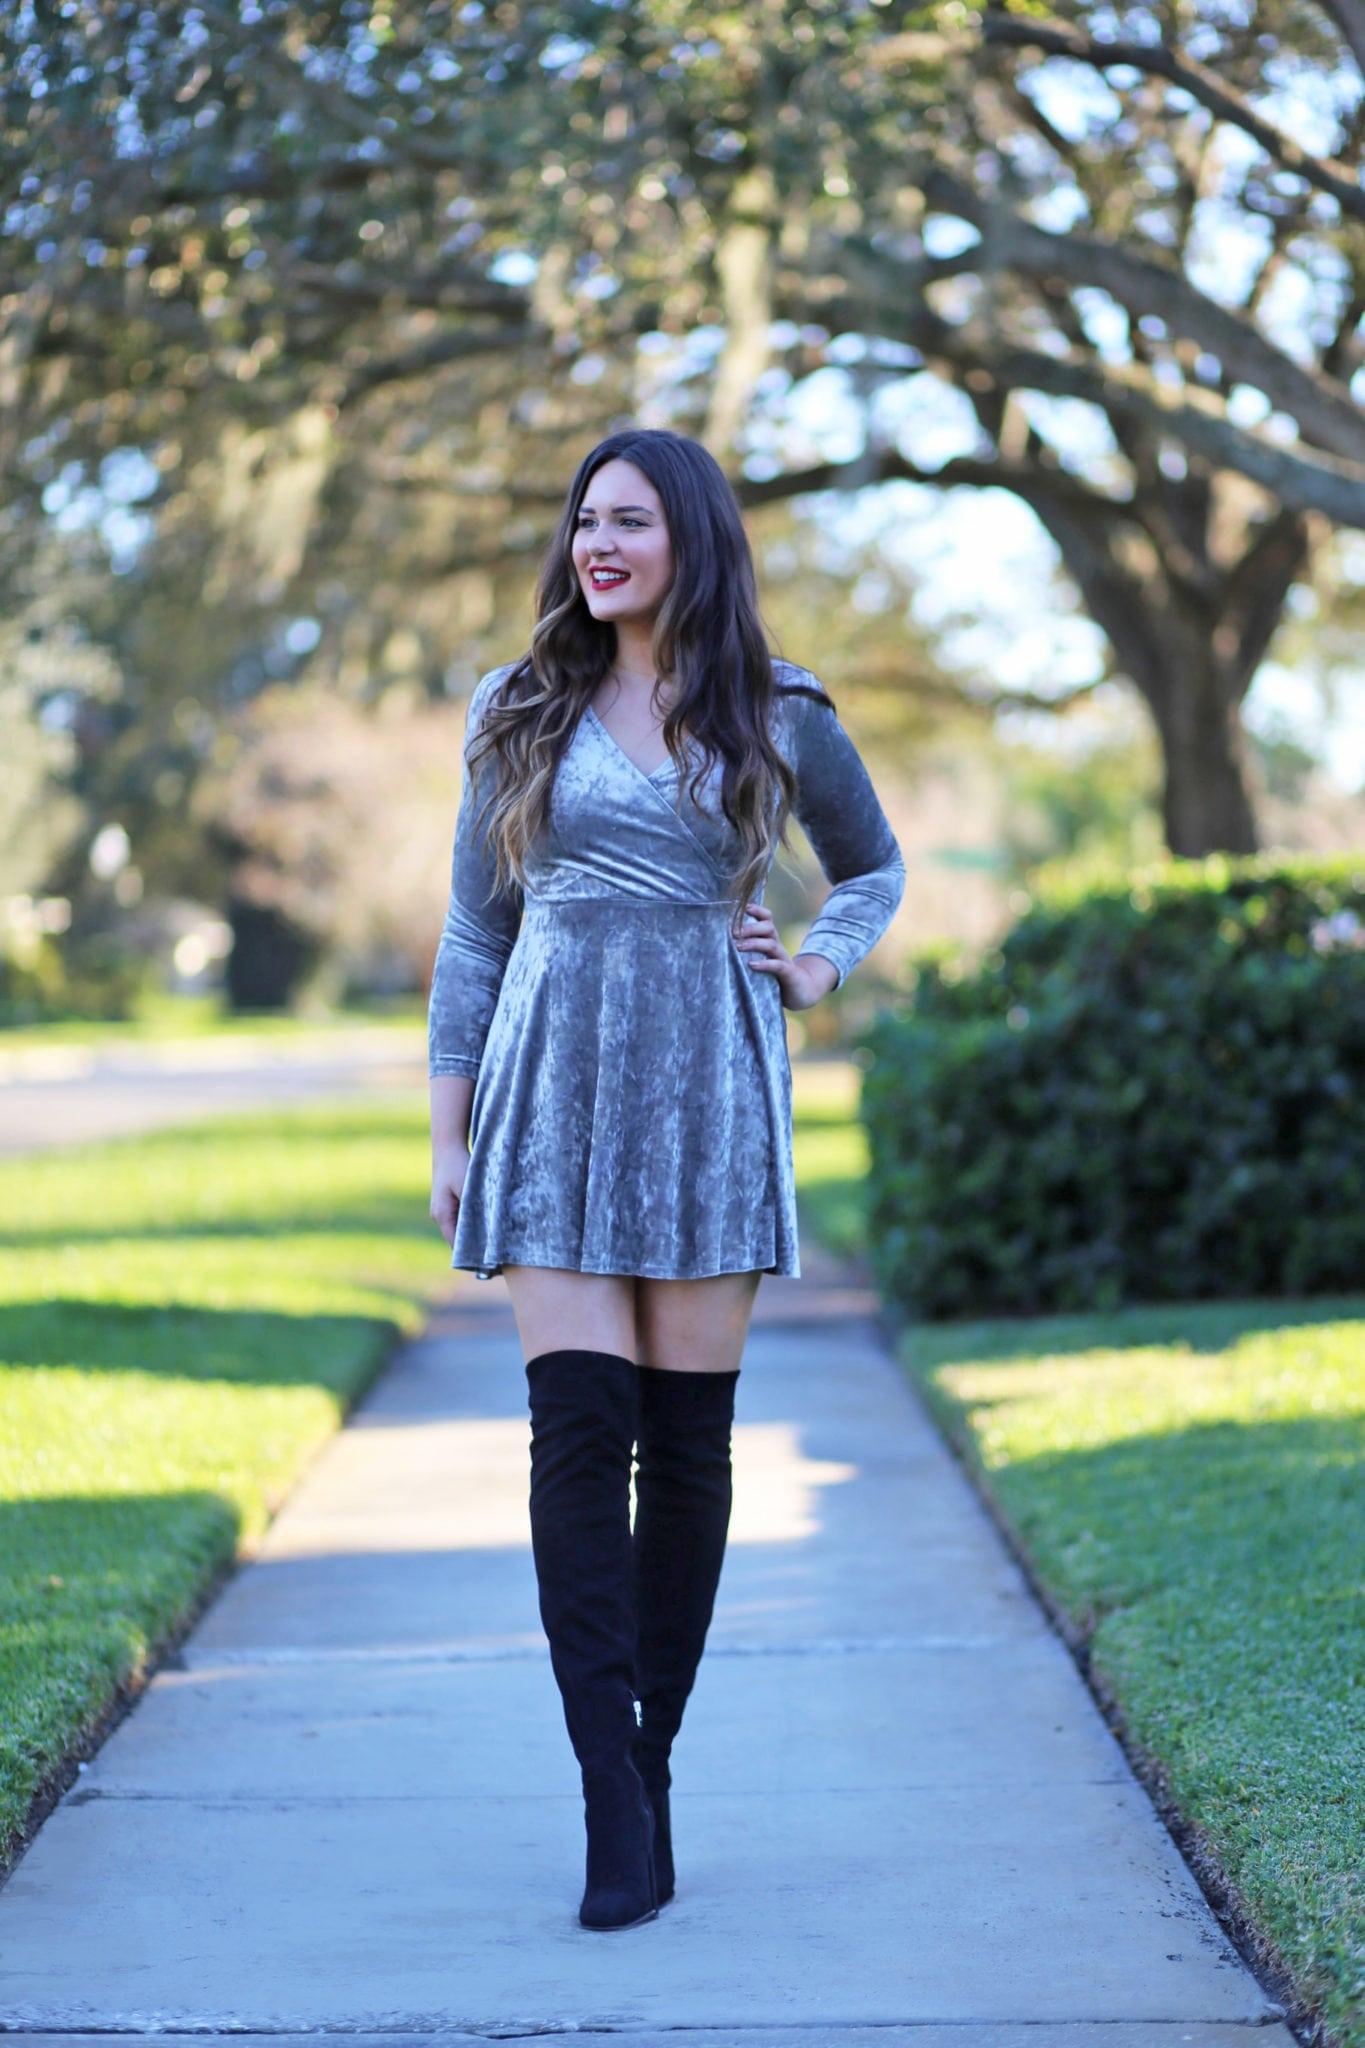 velvet long sleeve dress otk boots winter fashion mother daughter outfit park Mash Elle beauty blogger